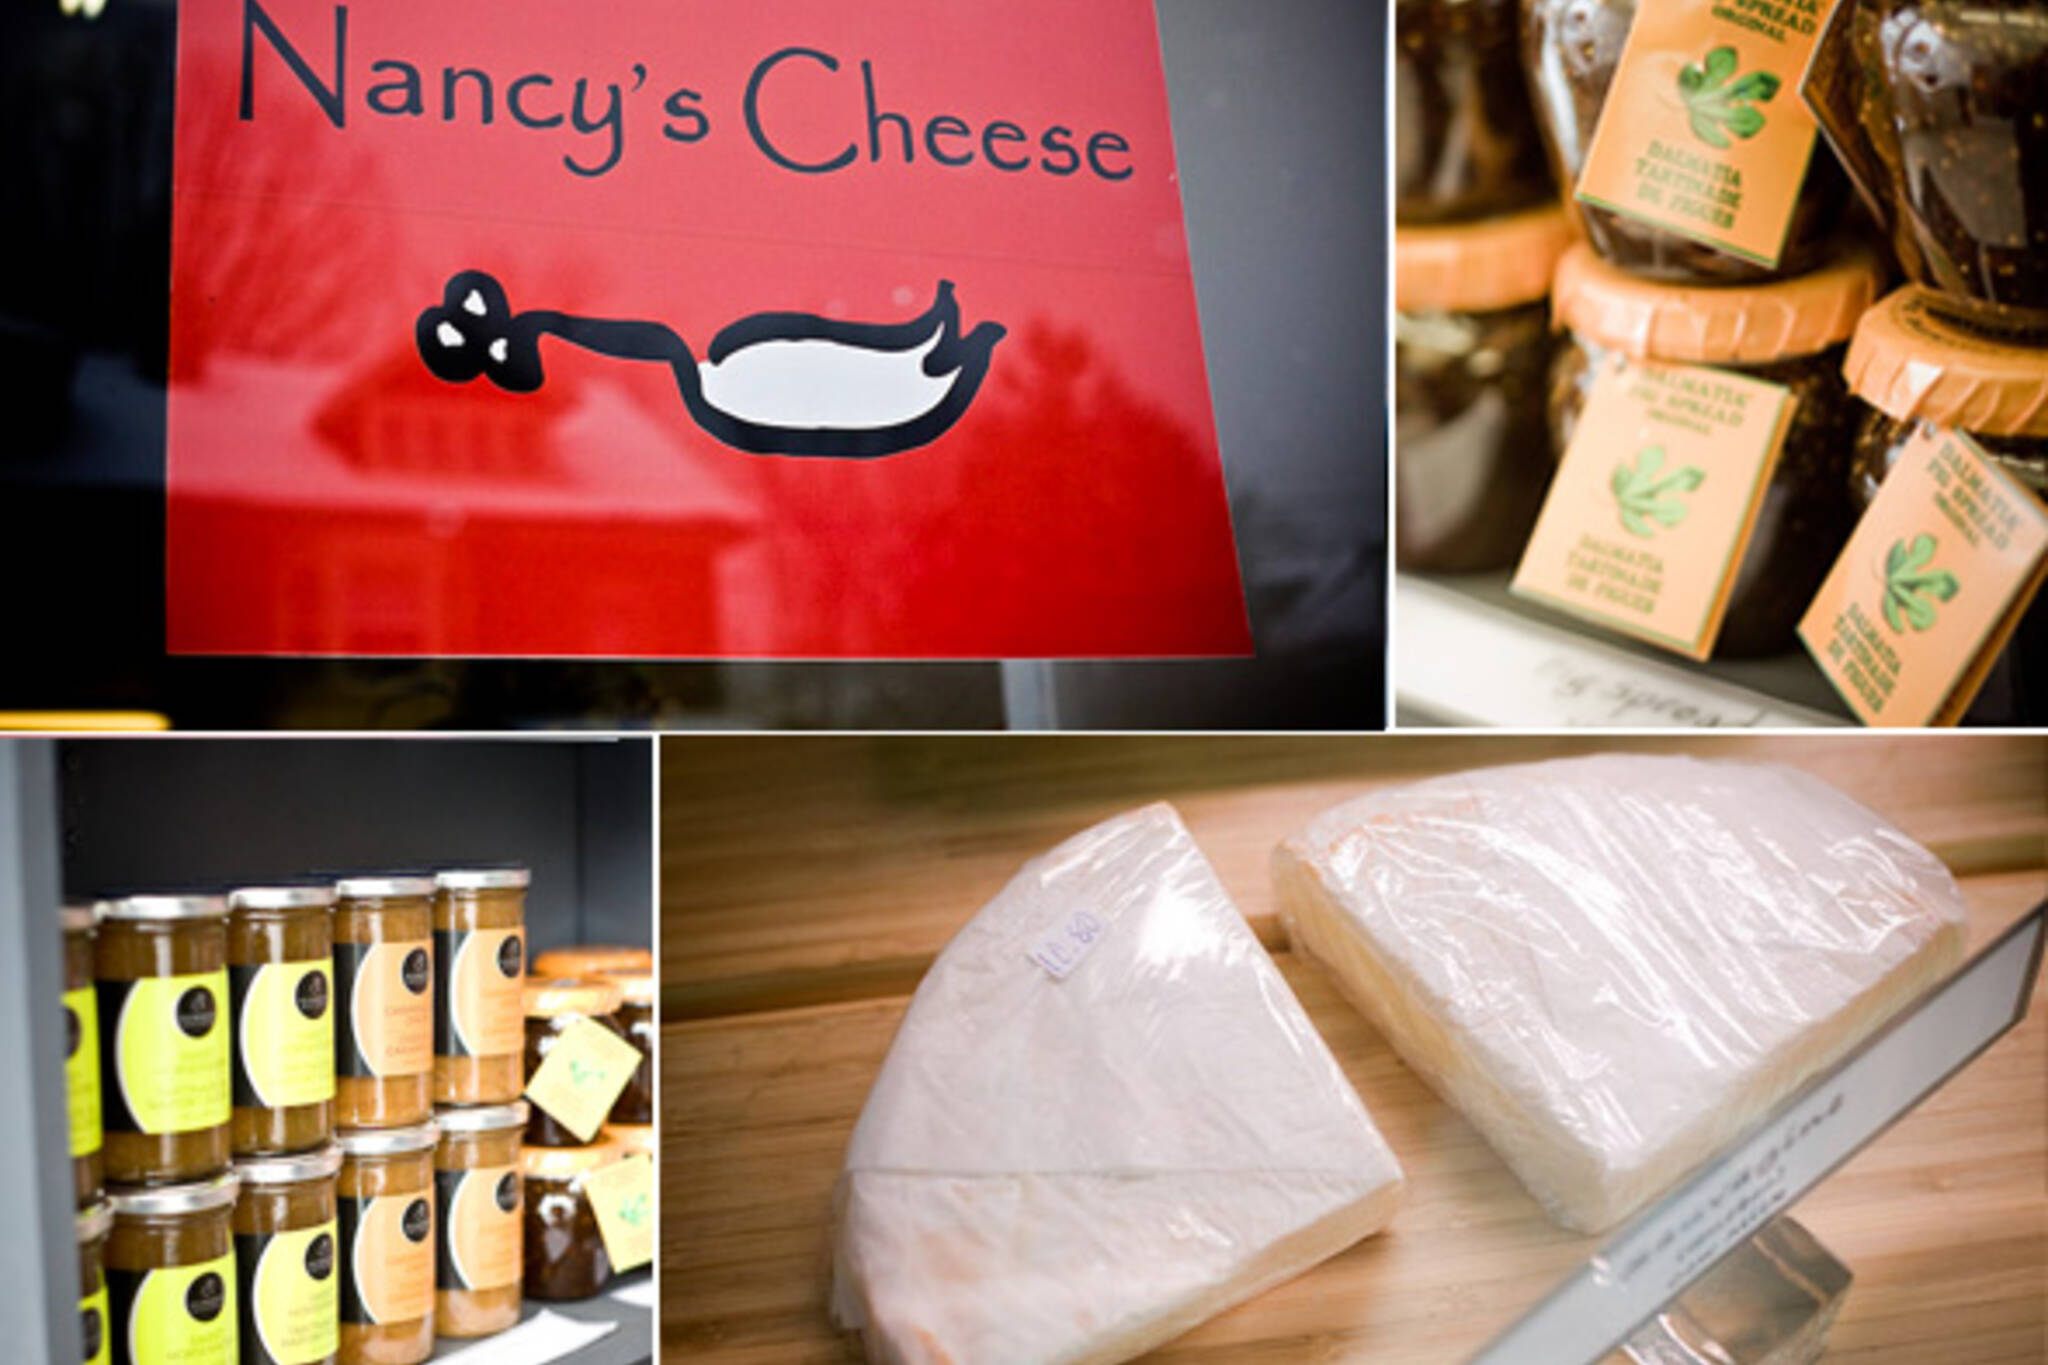 Nancy's Cheese